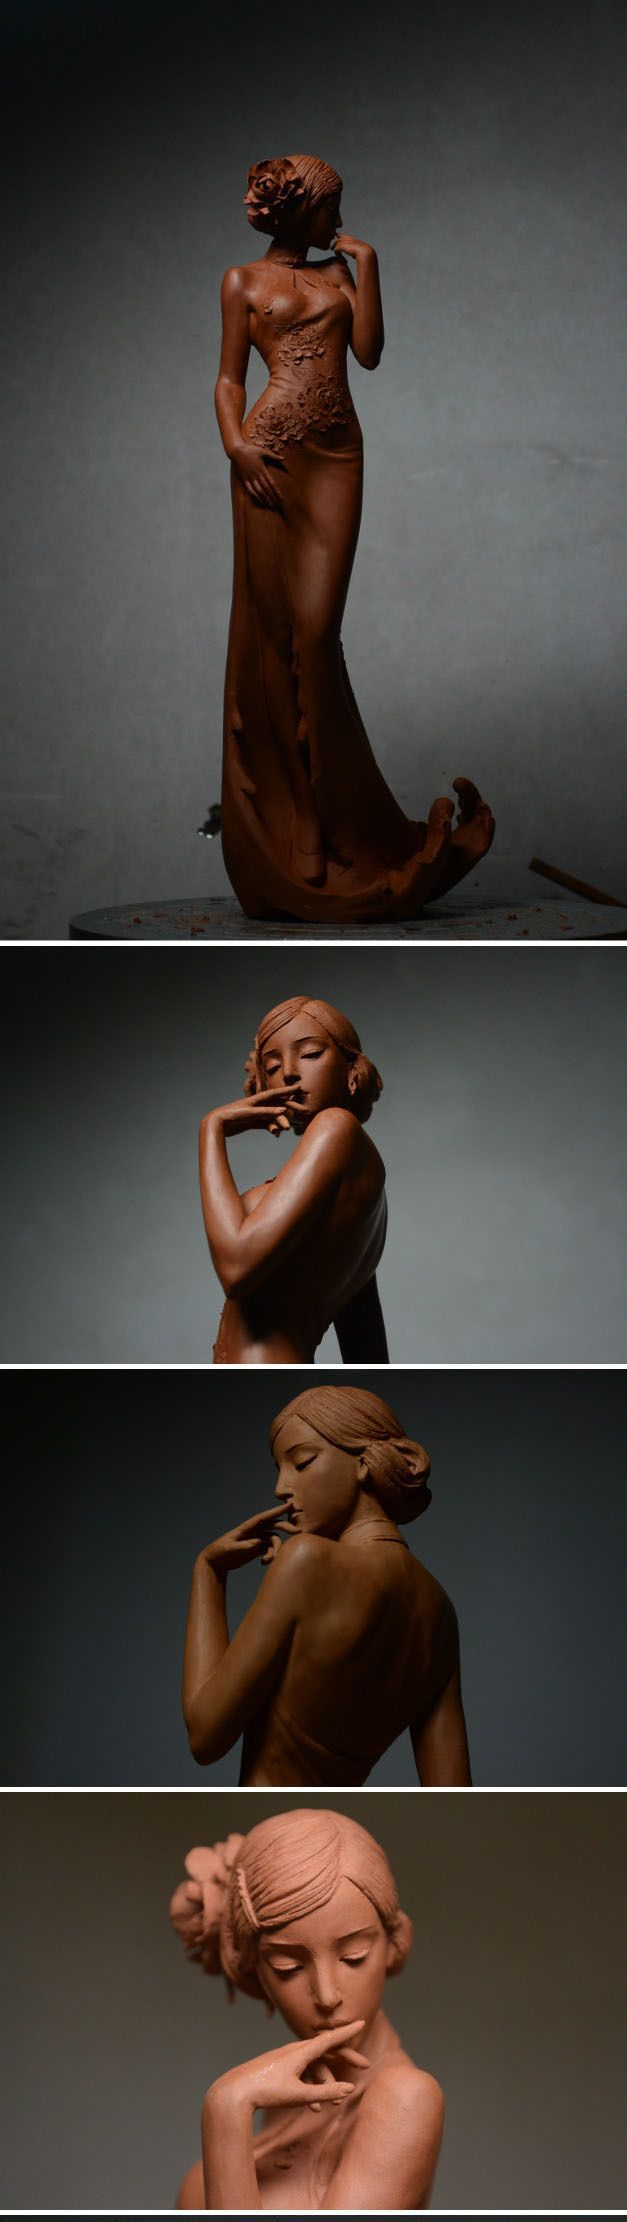 Clay sculpture - unknown sculptor - beautiful